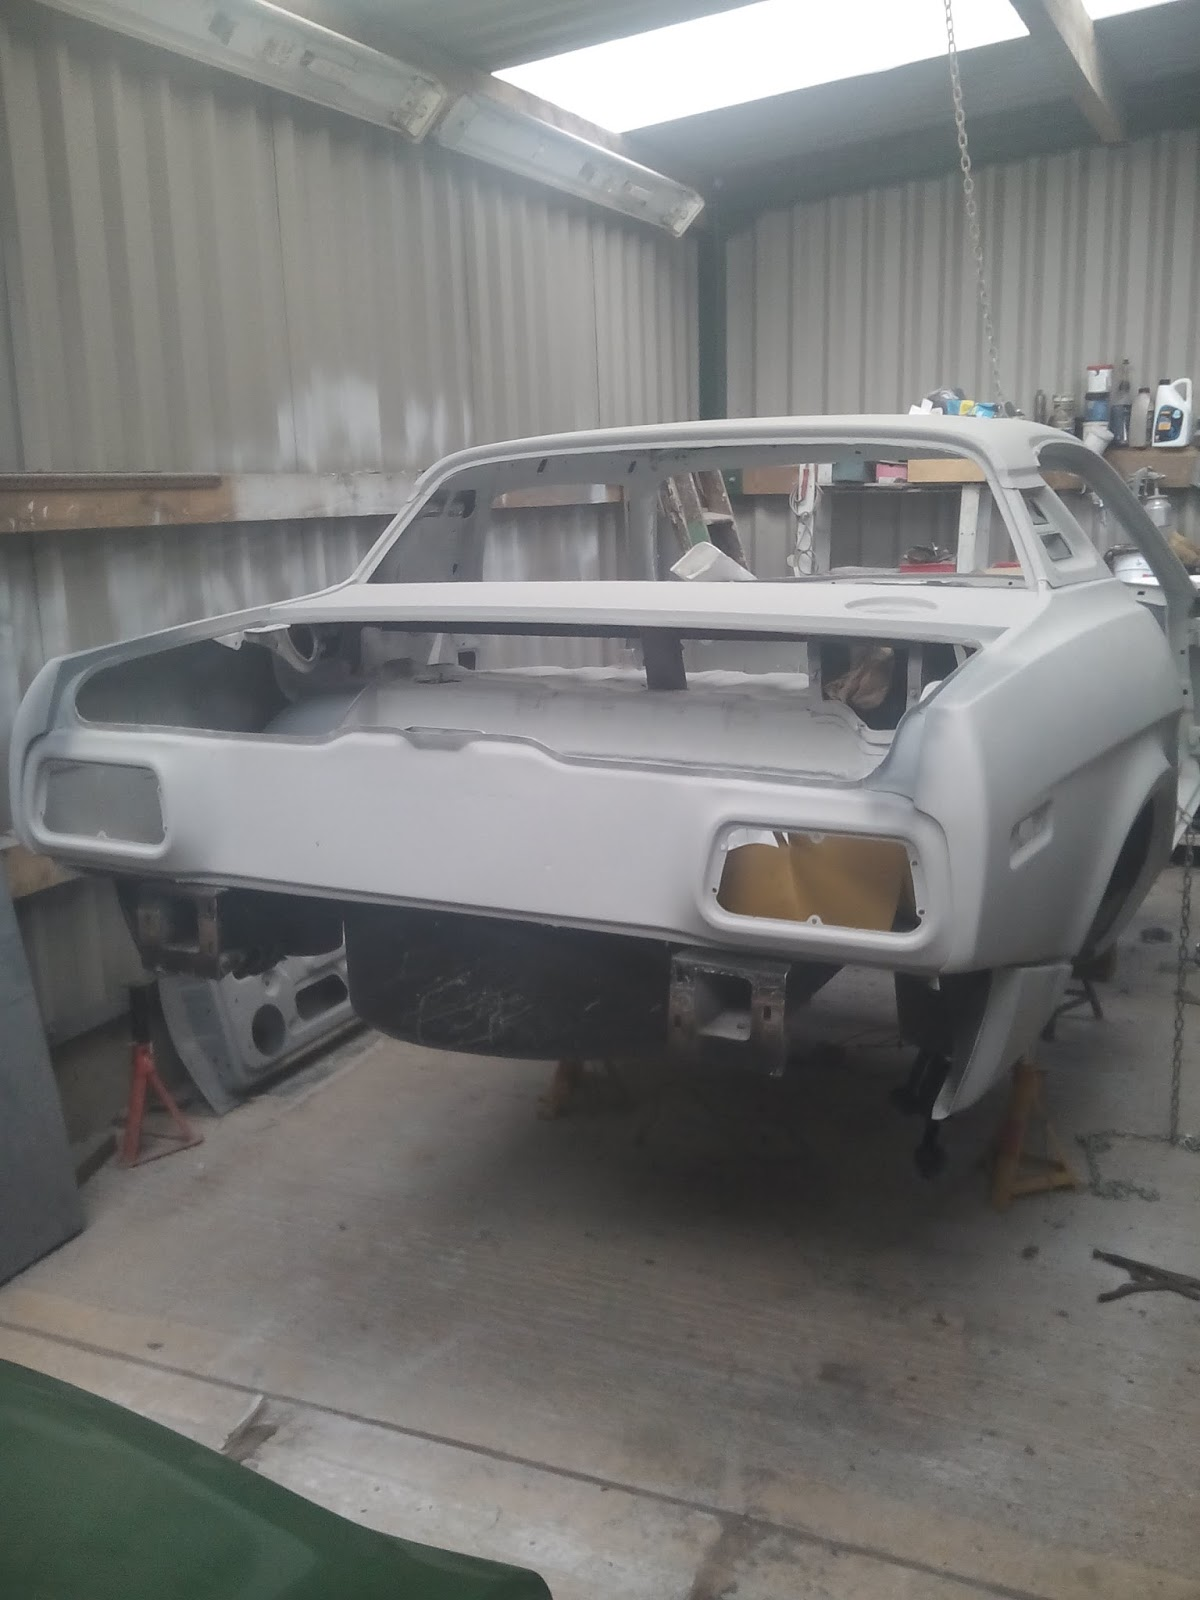 John's Triumph TR7 Restoration: A pivotal moment